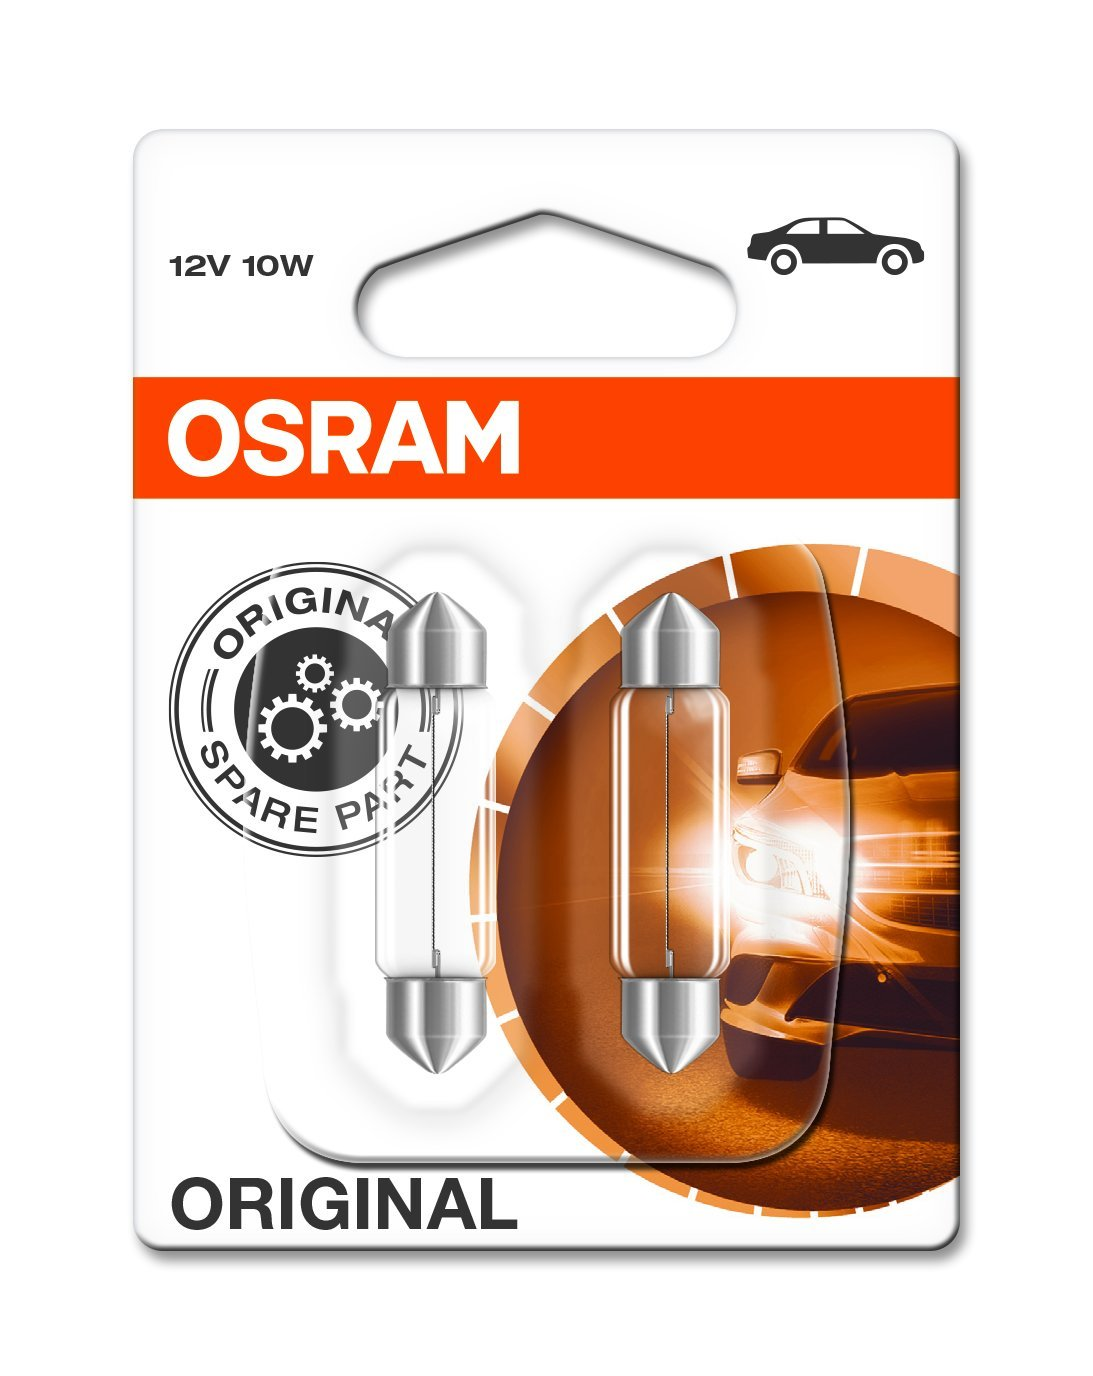 OSRAM Original 12V C10W lampada ausiliaria alogena 6411-02B in Blister doppio